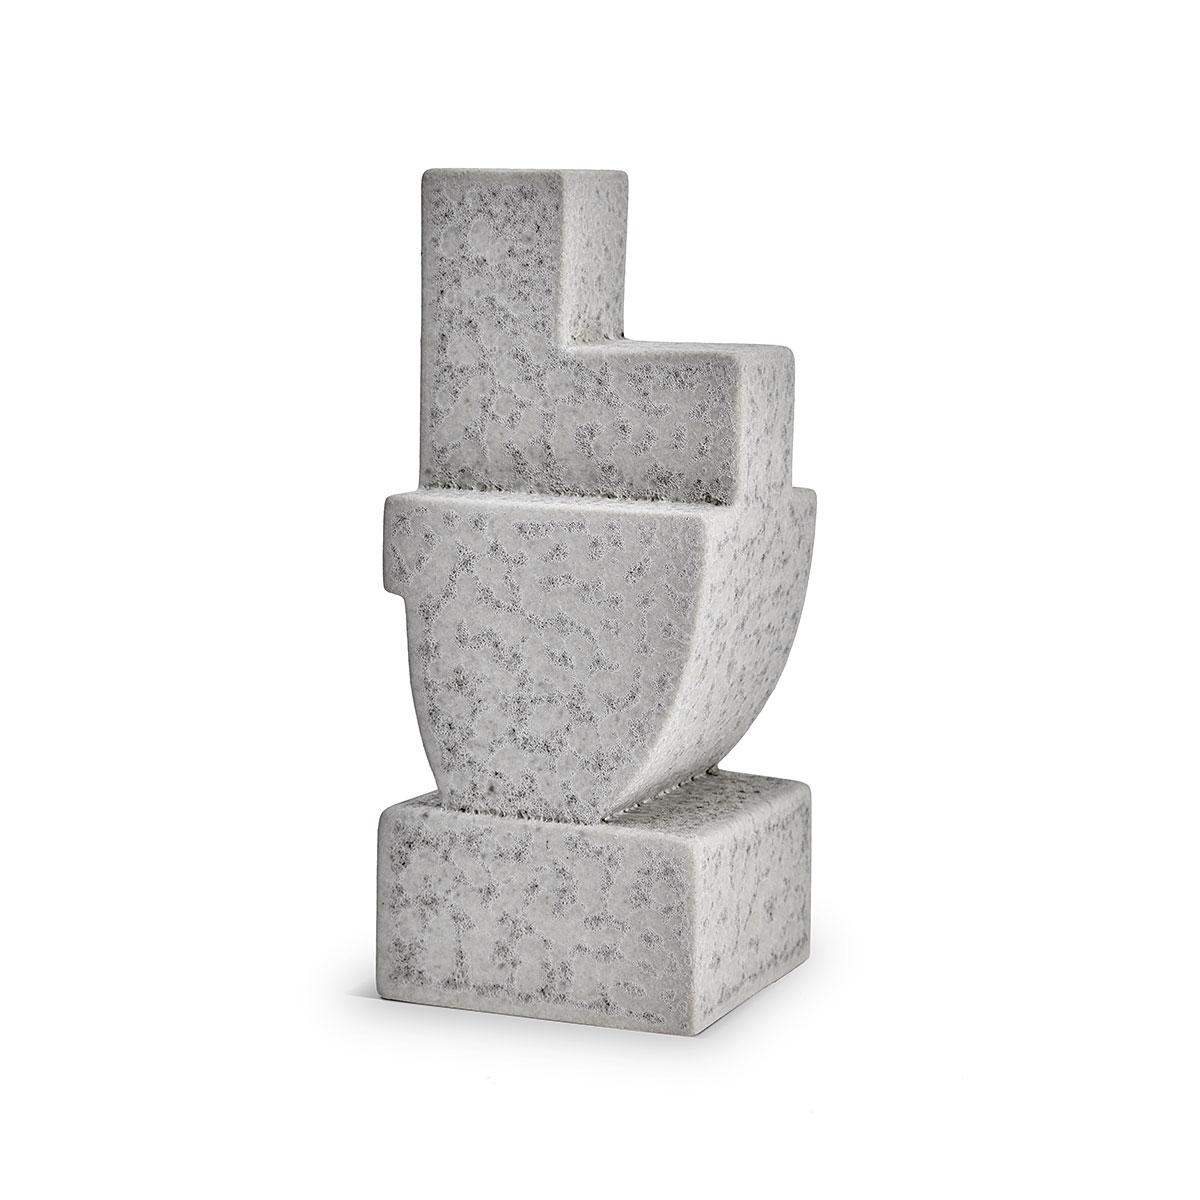 L'Objet I Cubisme Bookend Grey